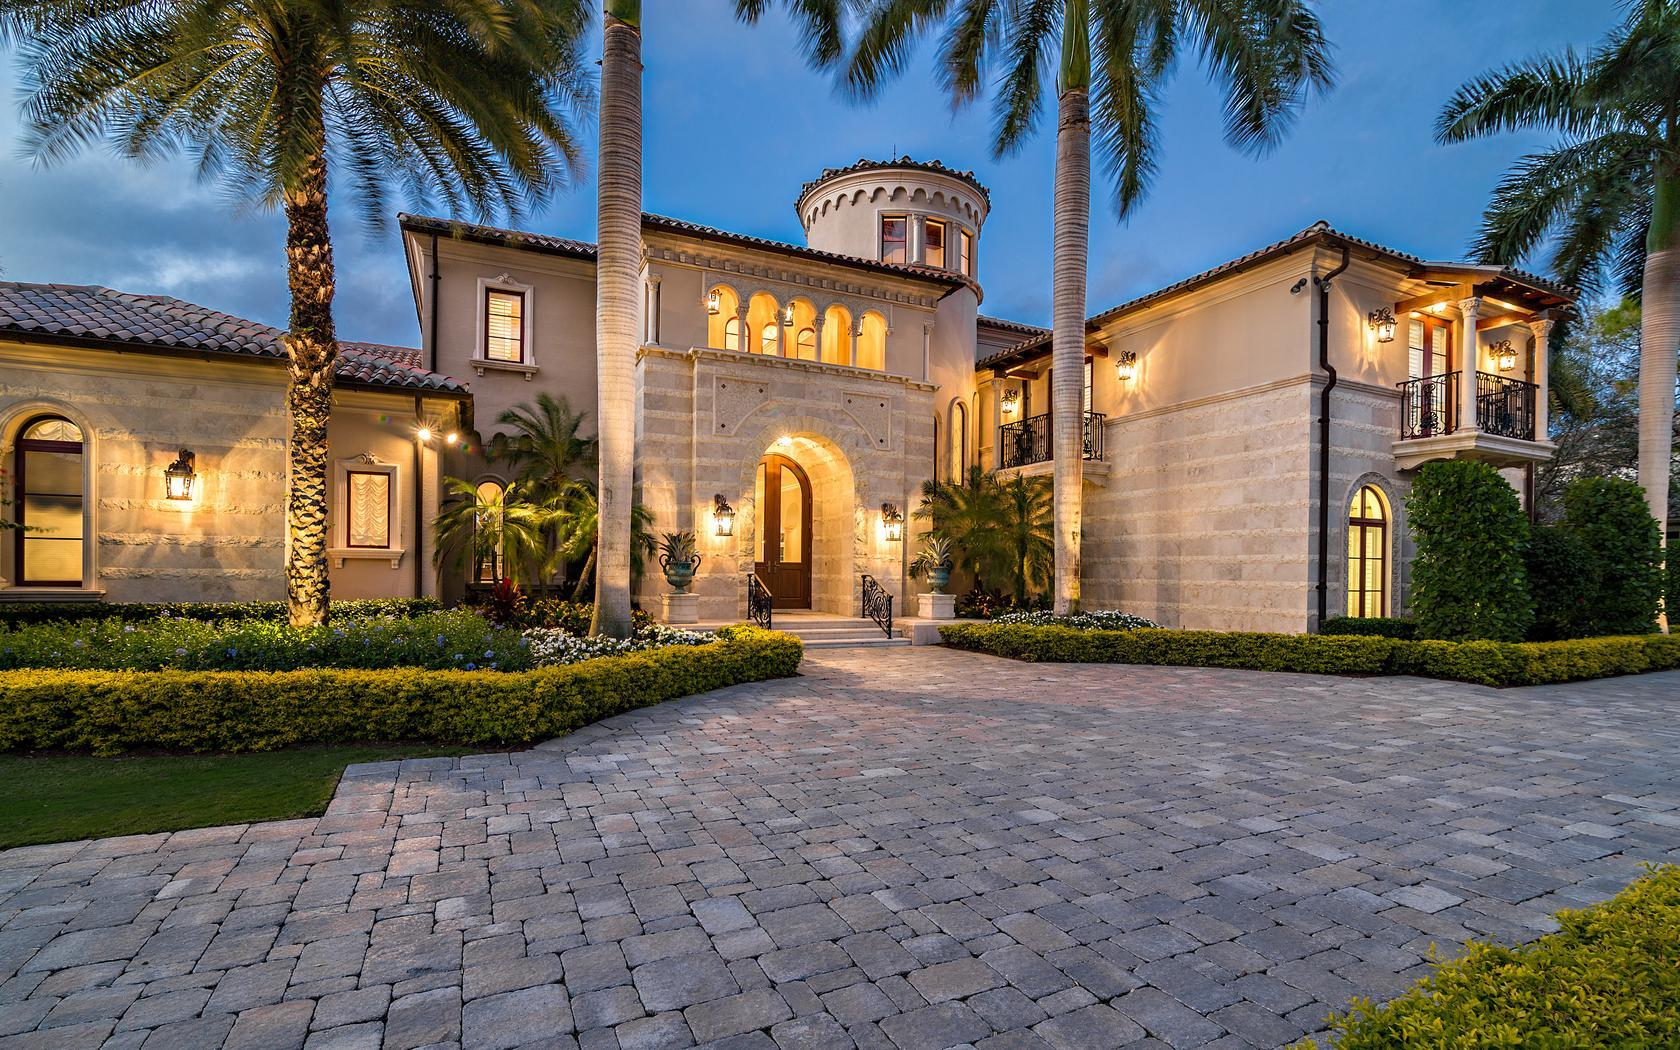 11609 Charisma Way, Palm Beach Gardens MLS Listing RX-10363187, Palm ...